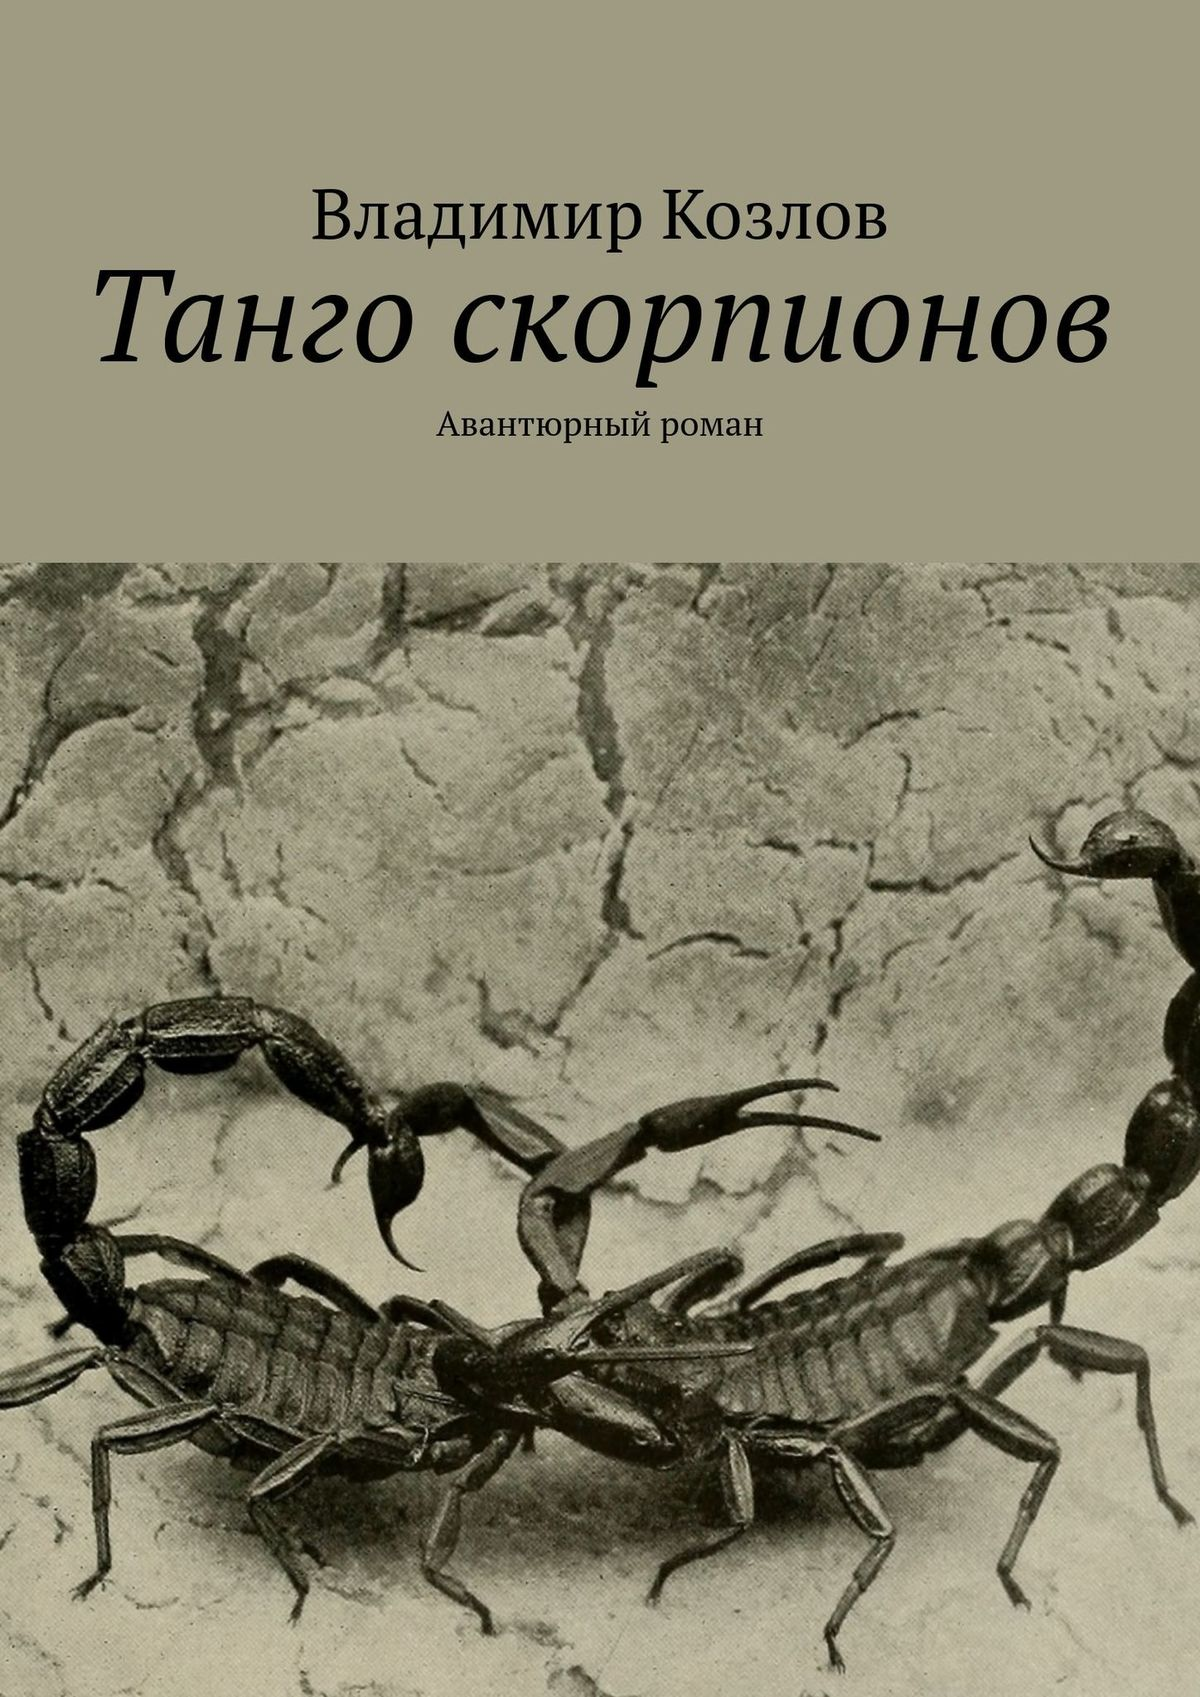 Владимир Козлов Танго скорпионов. Авантюрный роман для взрослых авантюрный роман